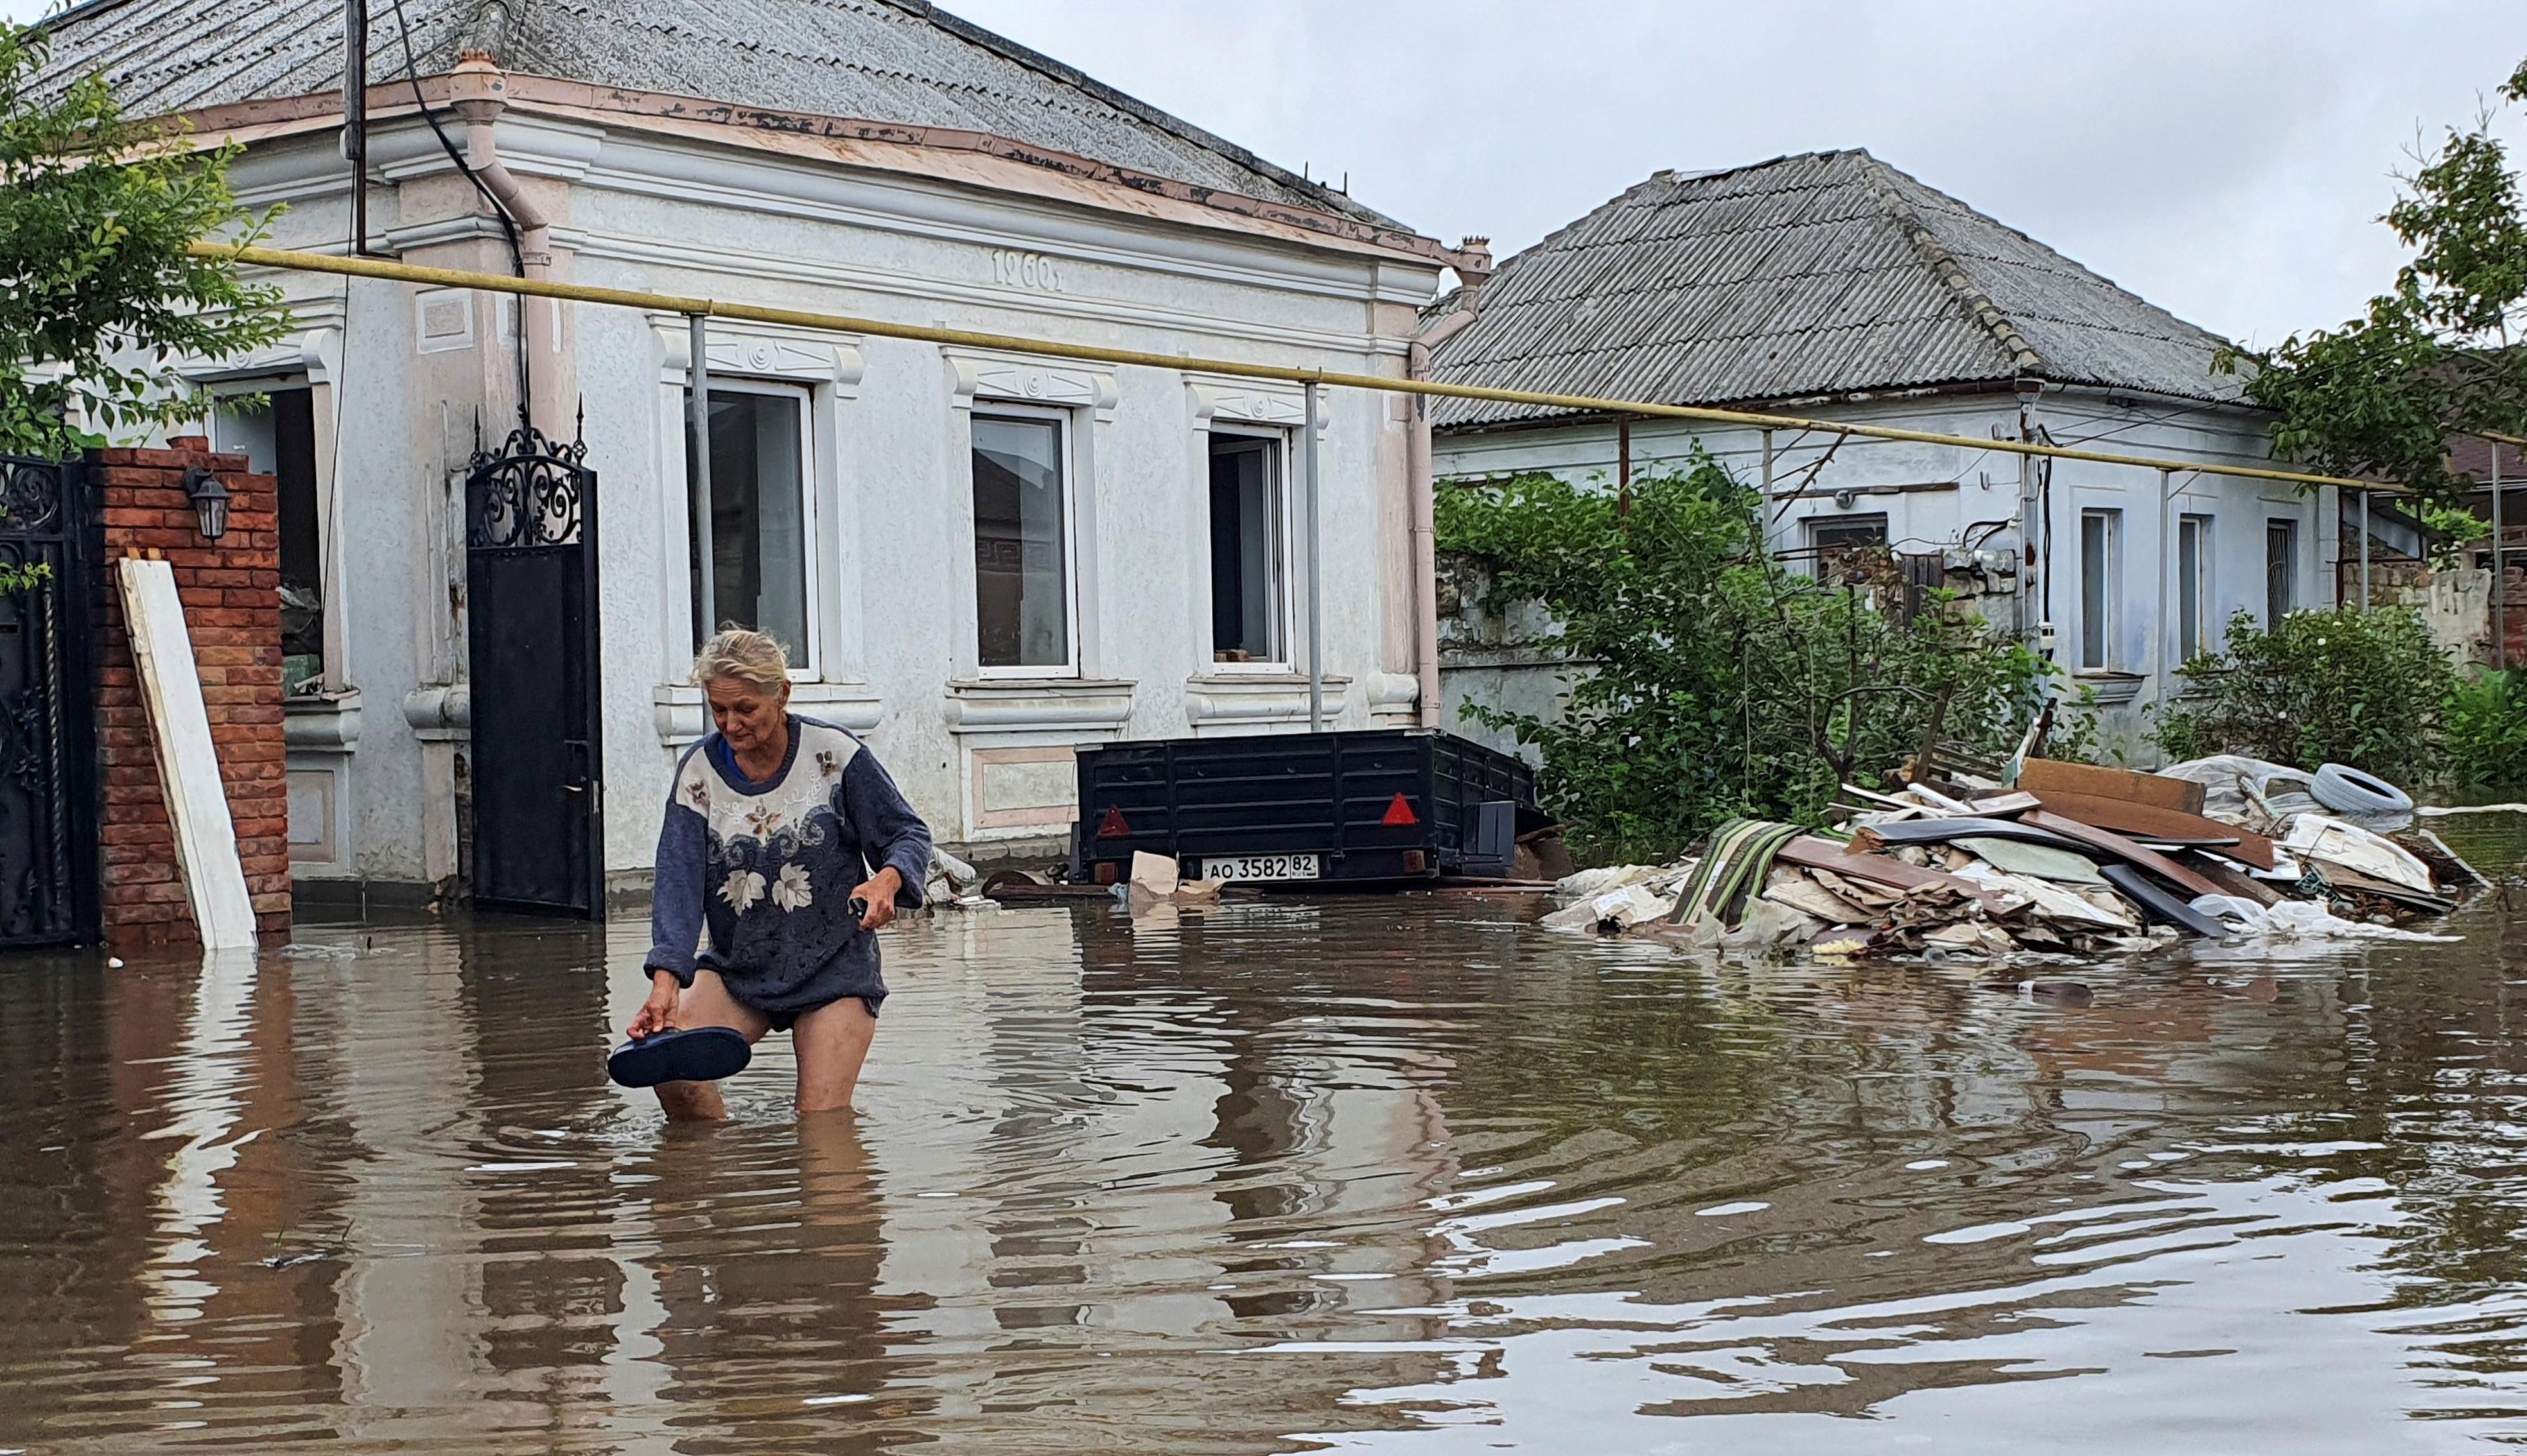 A woman walks along a flooded street following heavy rainfall in Europe.